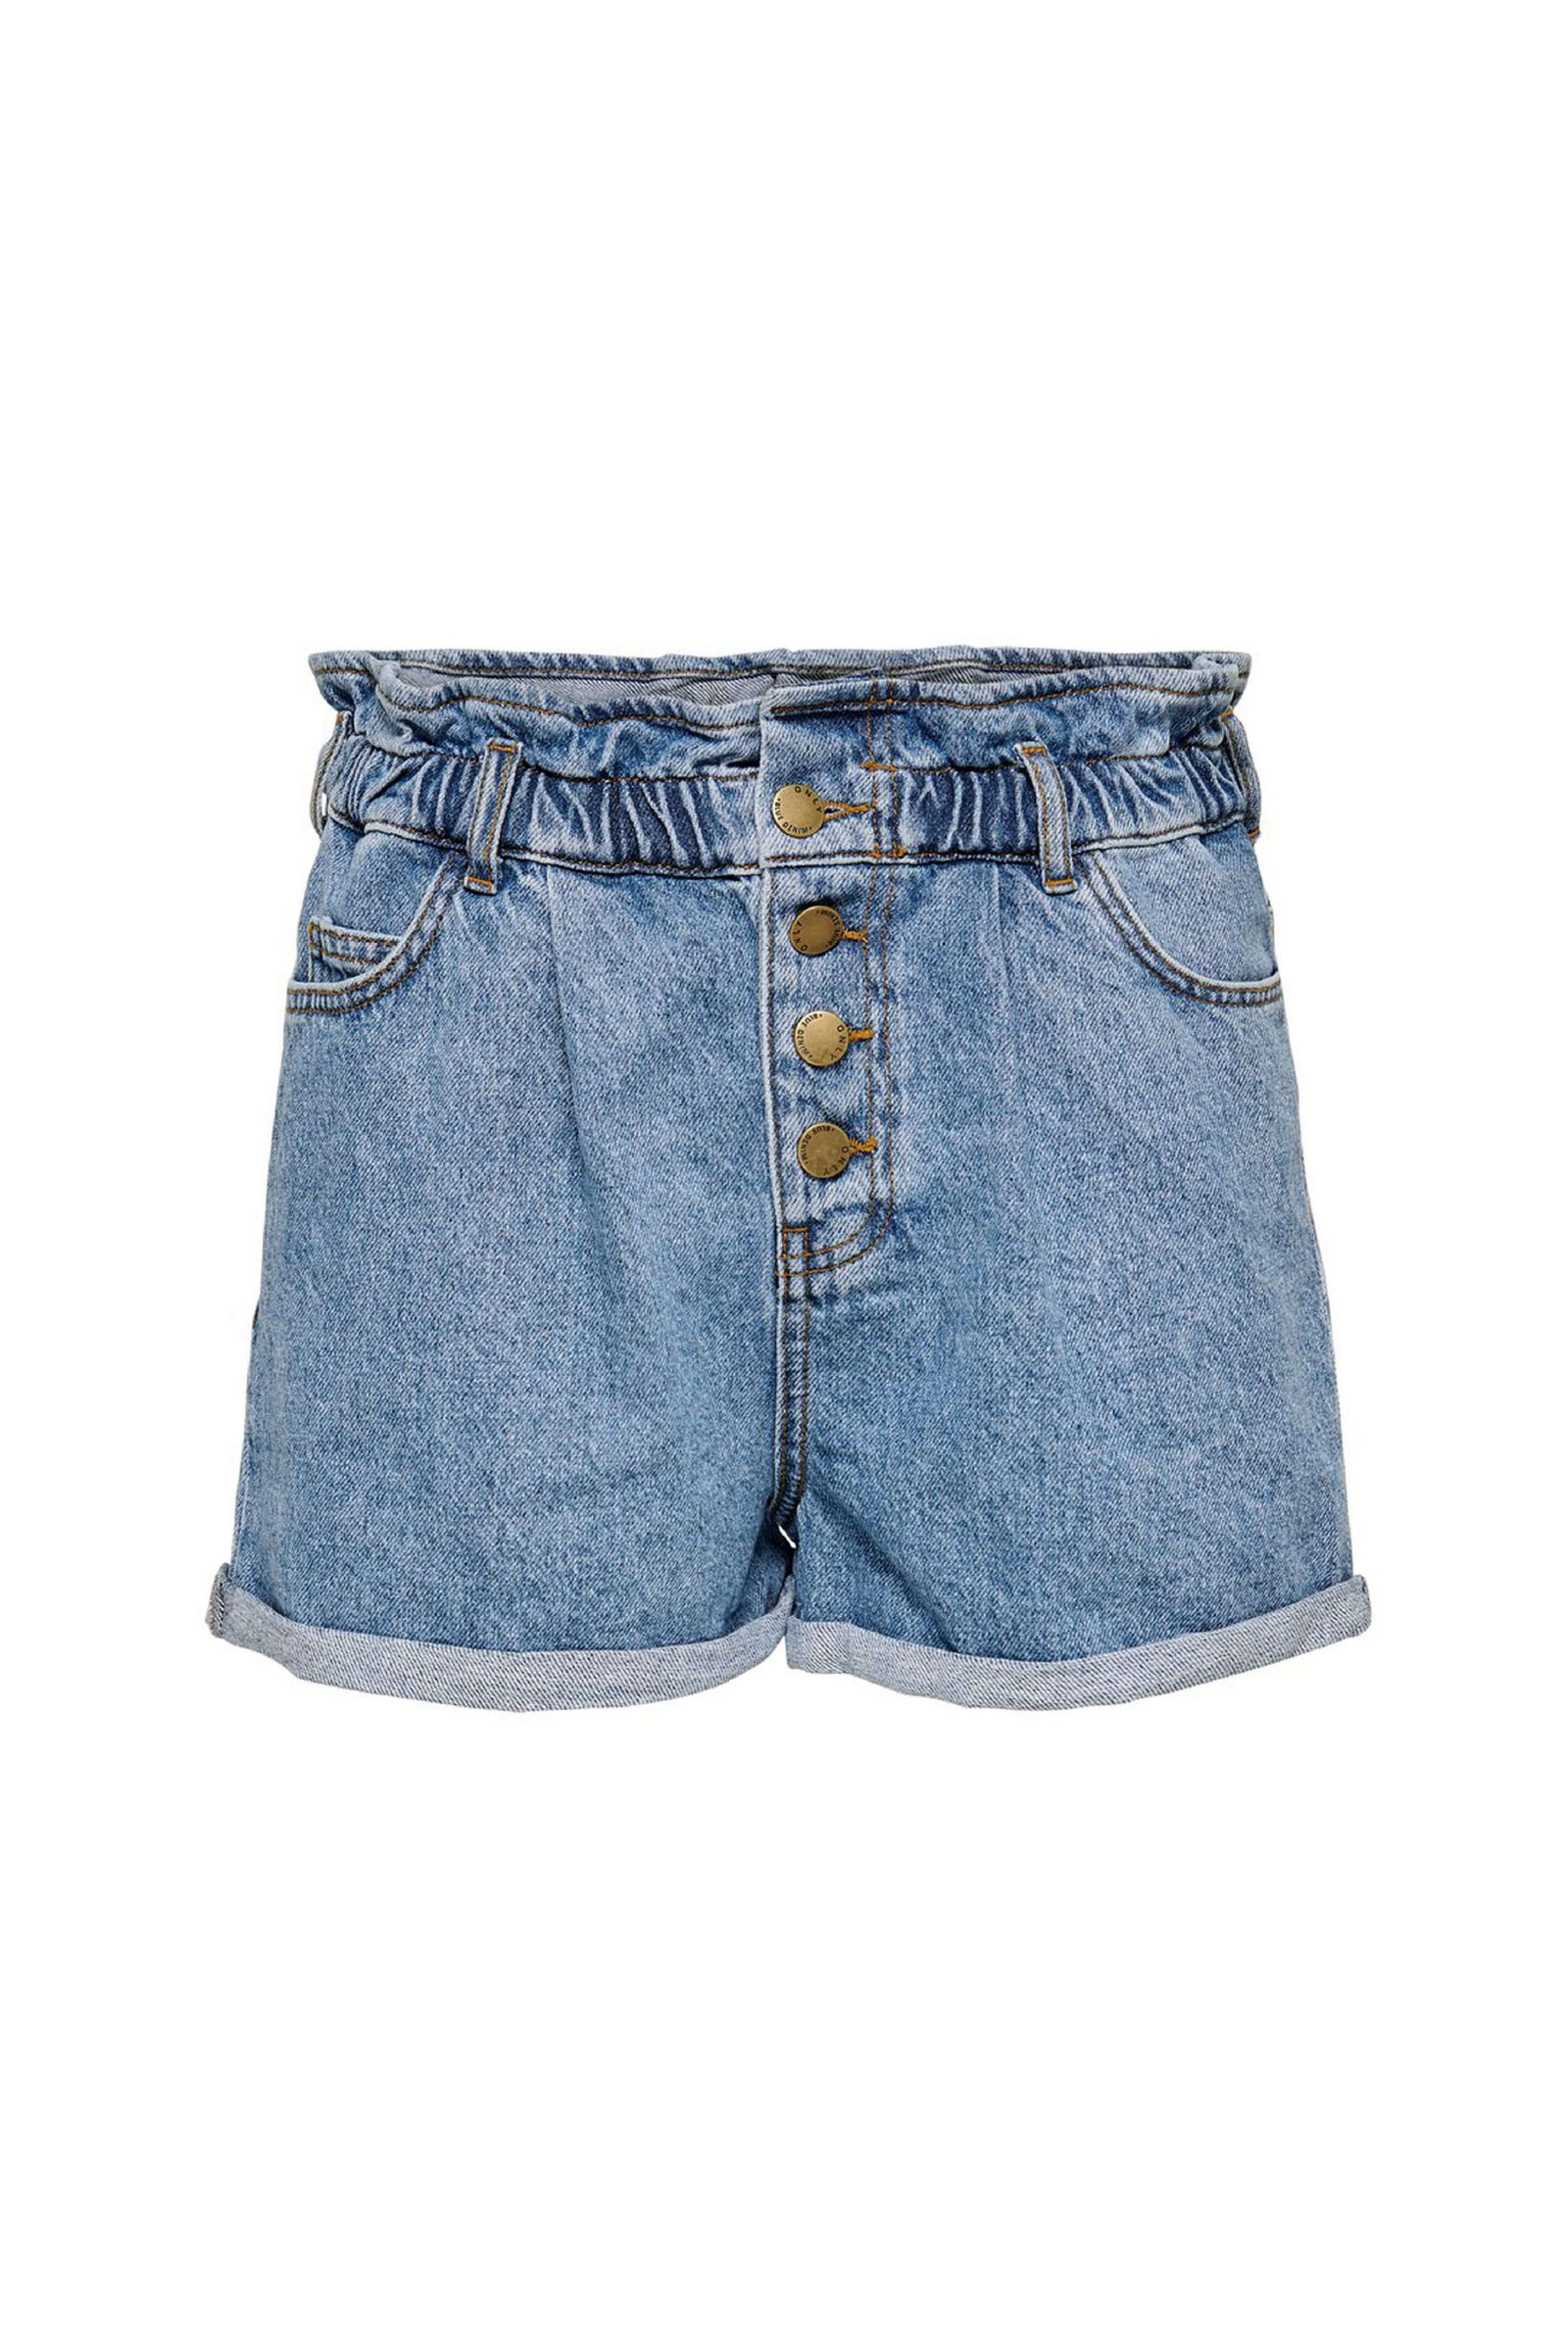 ONLY Shorts Donna Medium Blue Denim ONLY      15200196Medium Blue Denim